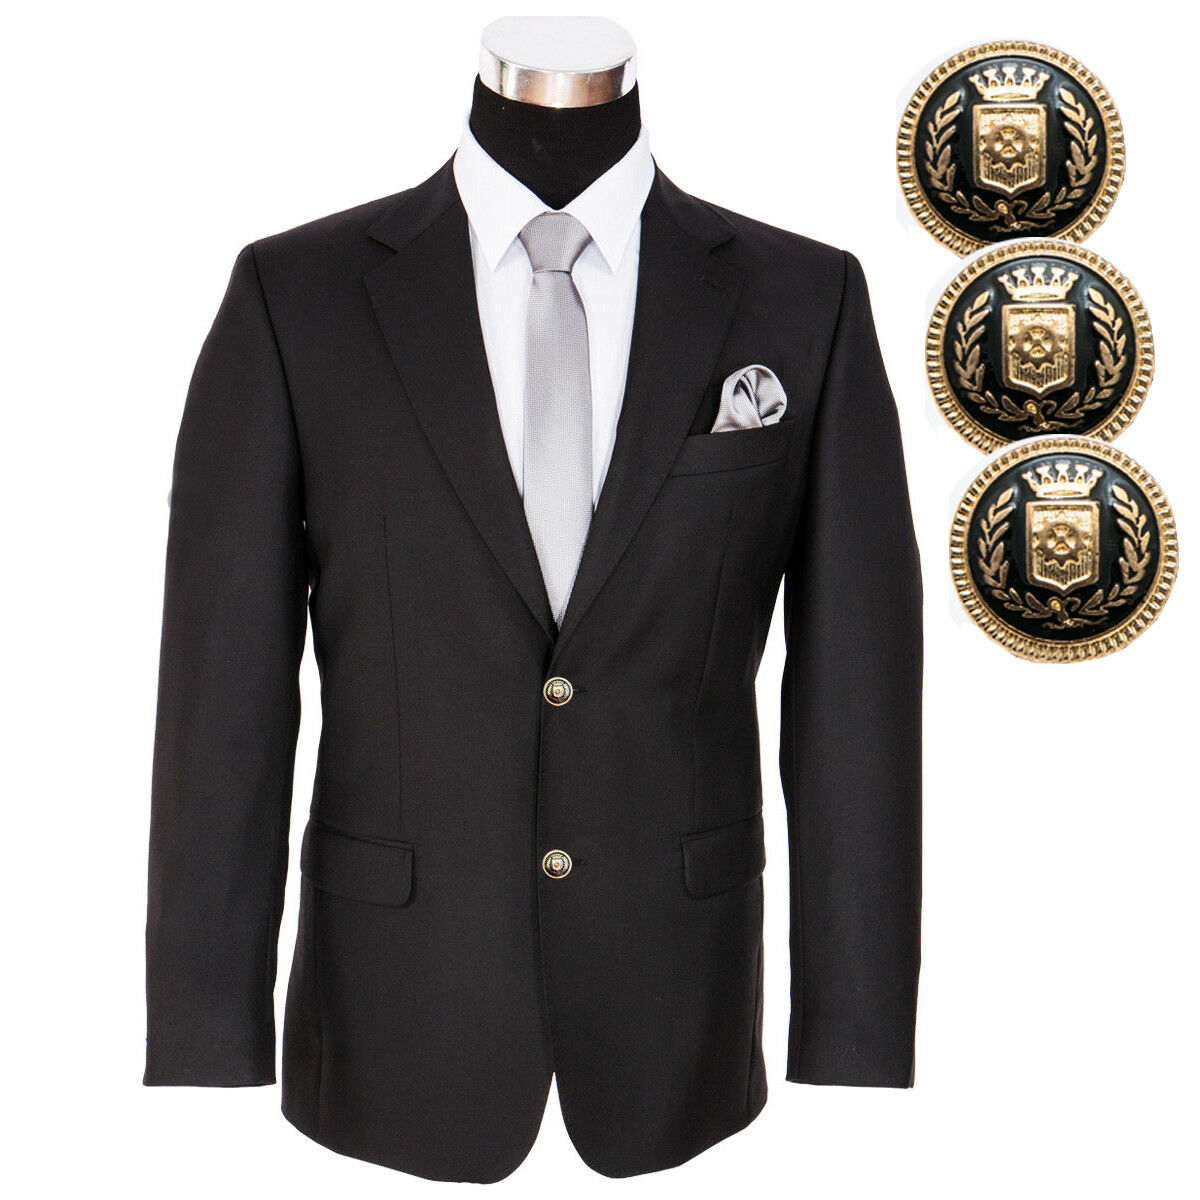 Herren Sakko Herrensakko Club Sakko Geschäft Moden Herren Blazer  Geschäft Mode.